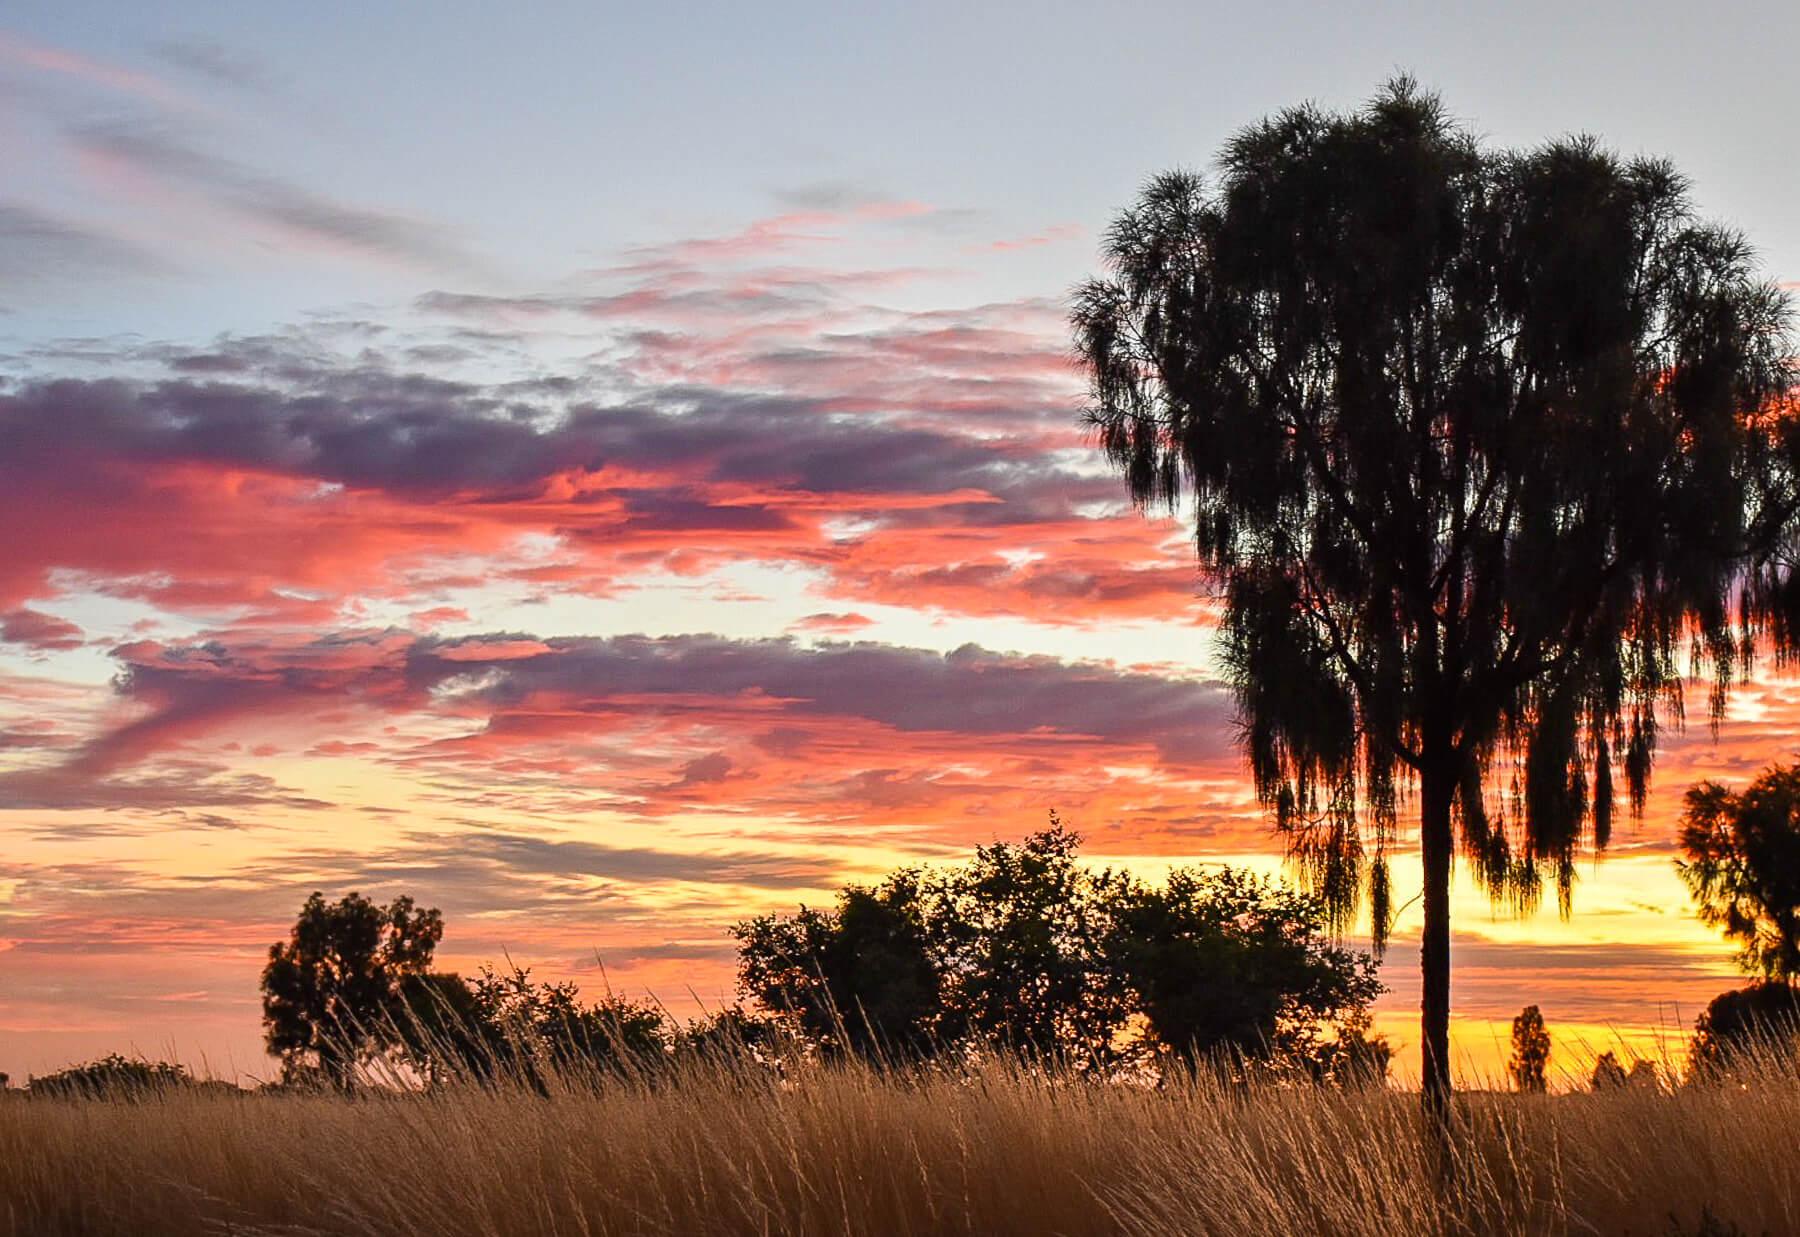 Grassy plains and Australian trees below a vibrant sunset